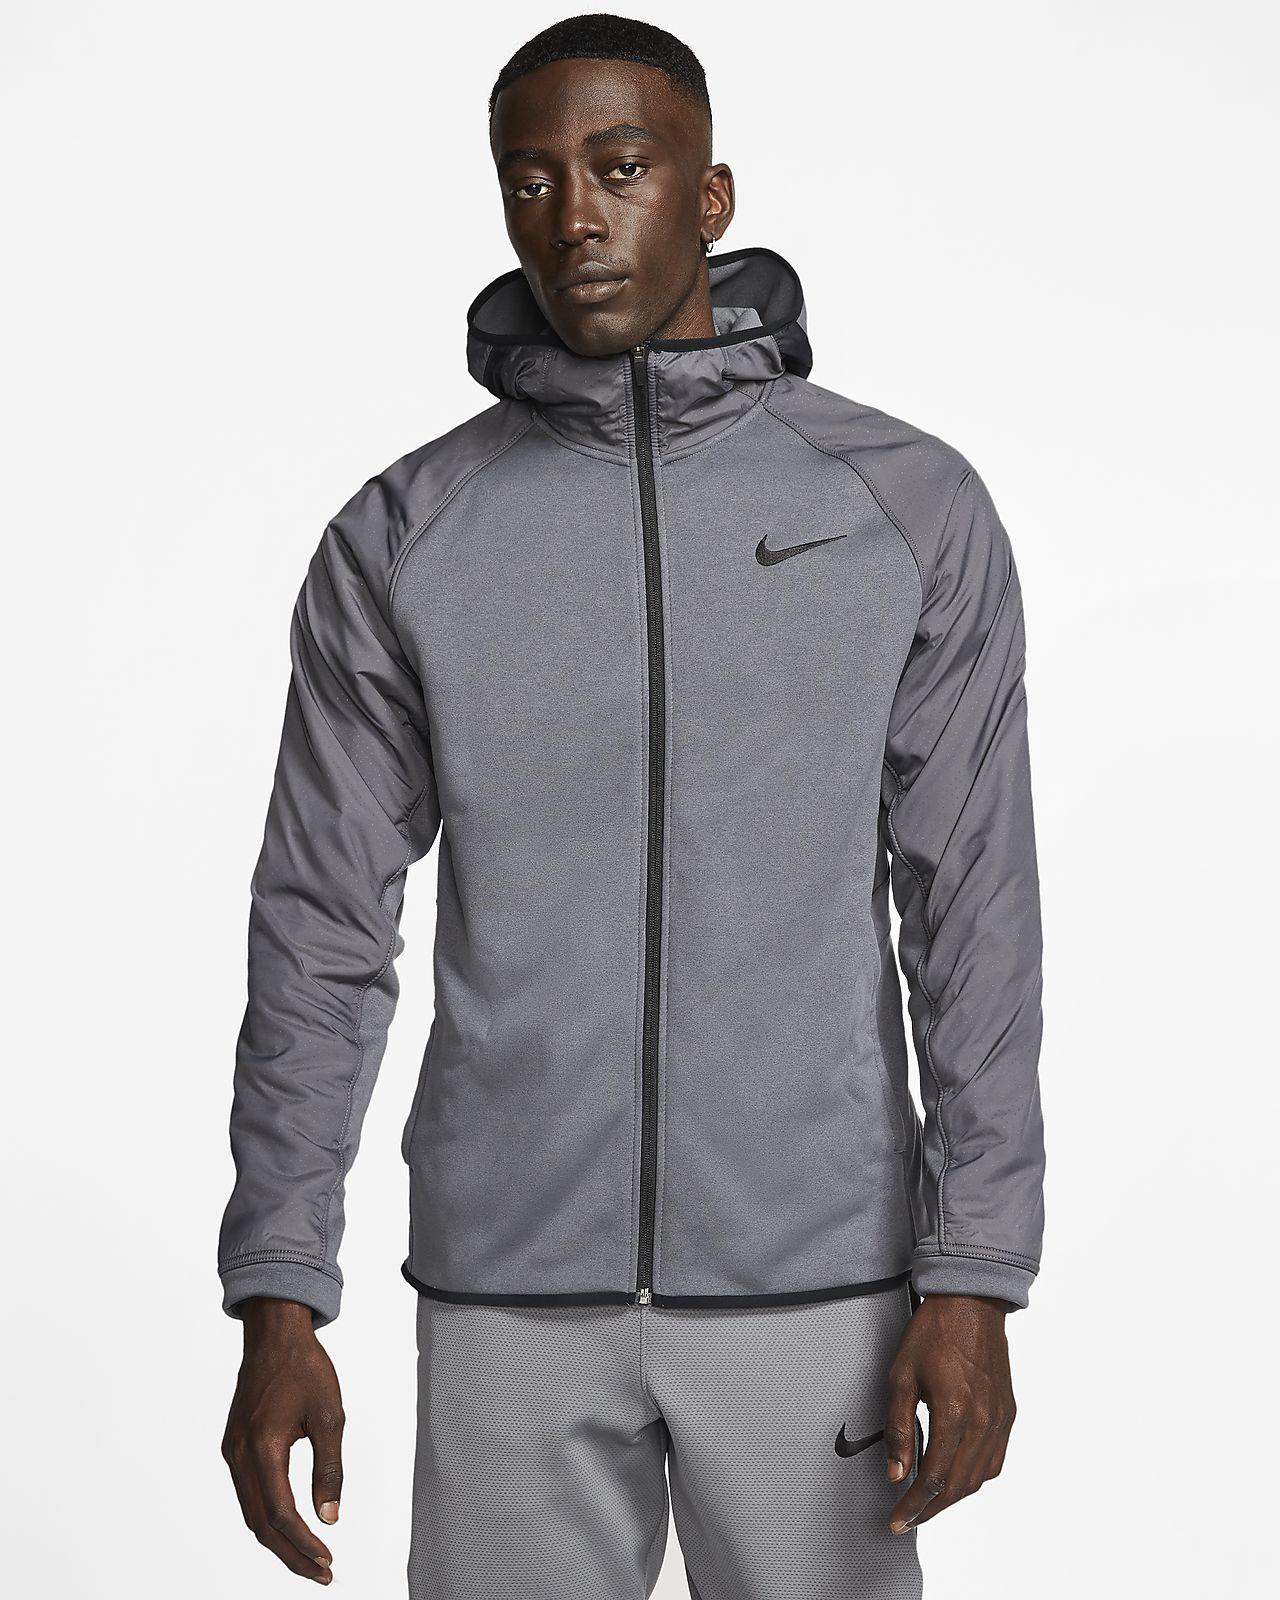 Nike Protect Men's Basketball Jacket Grey | Gray jacket